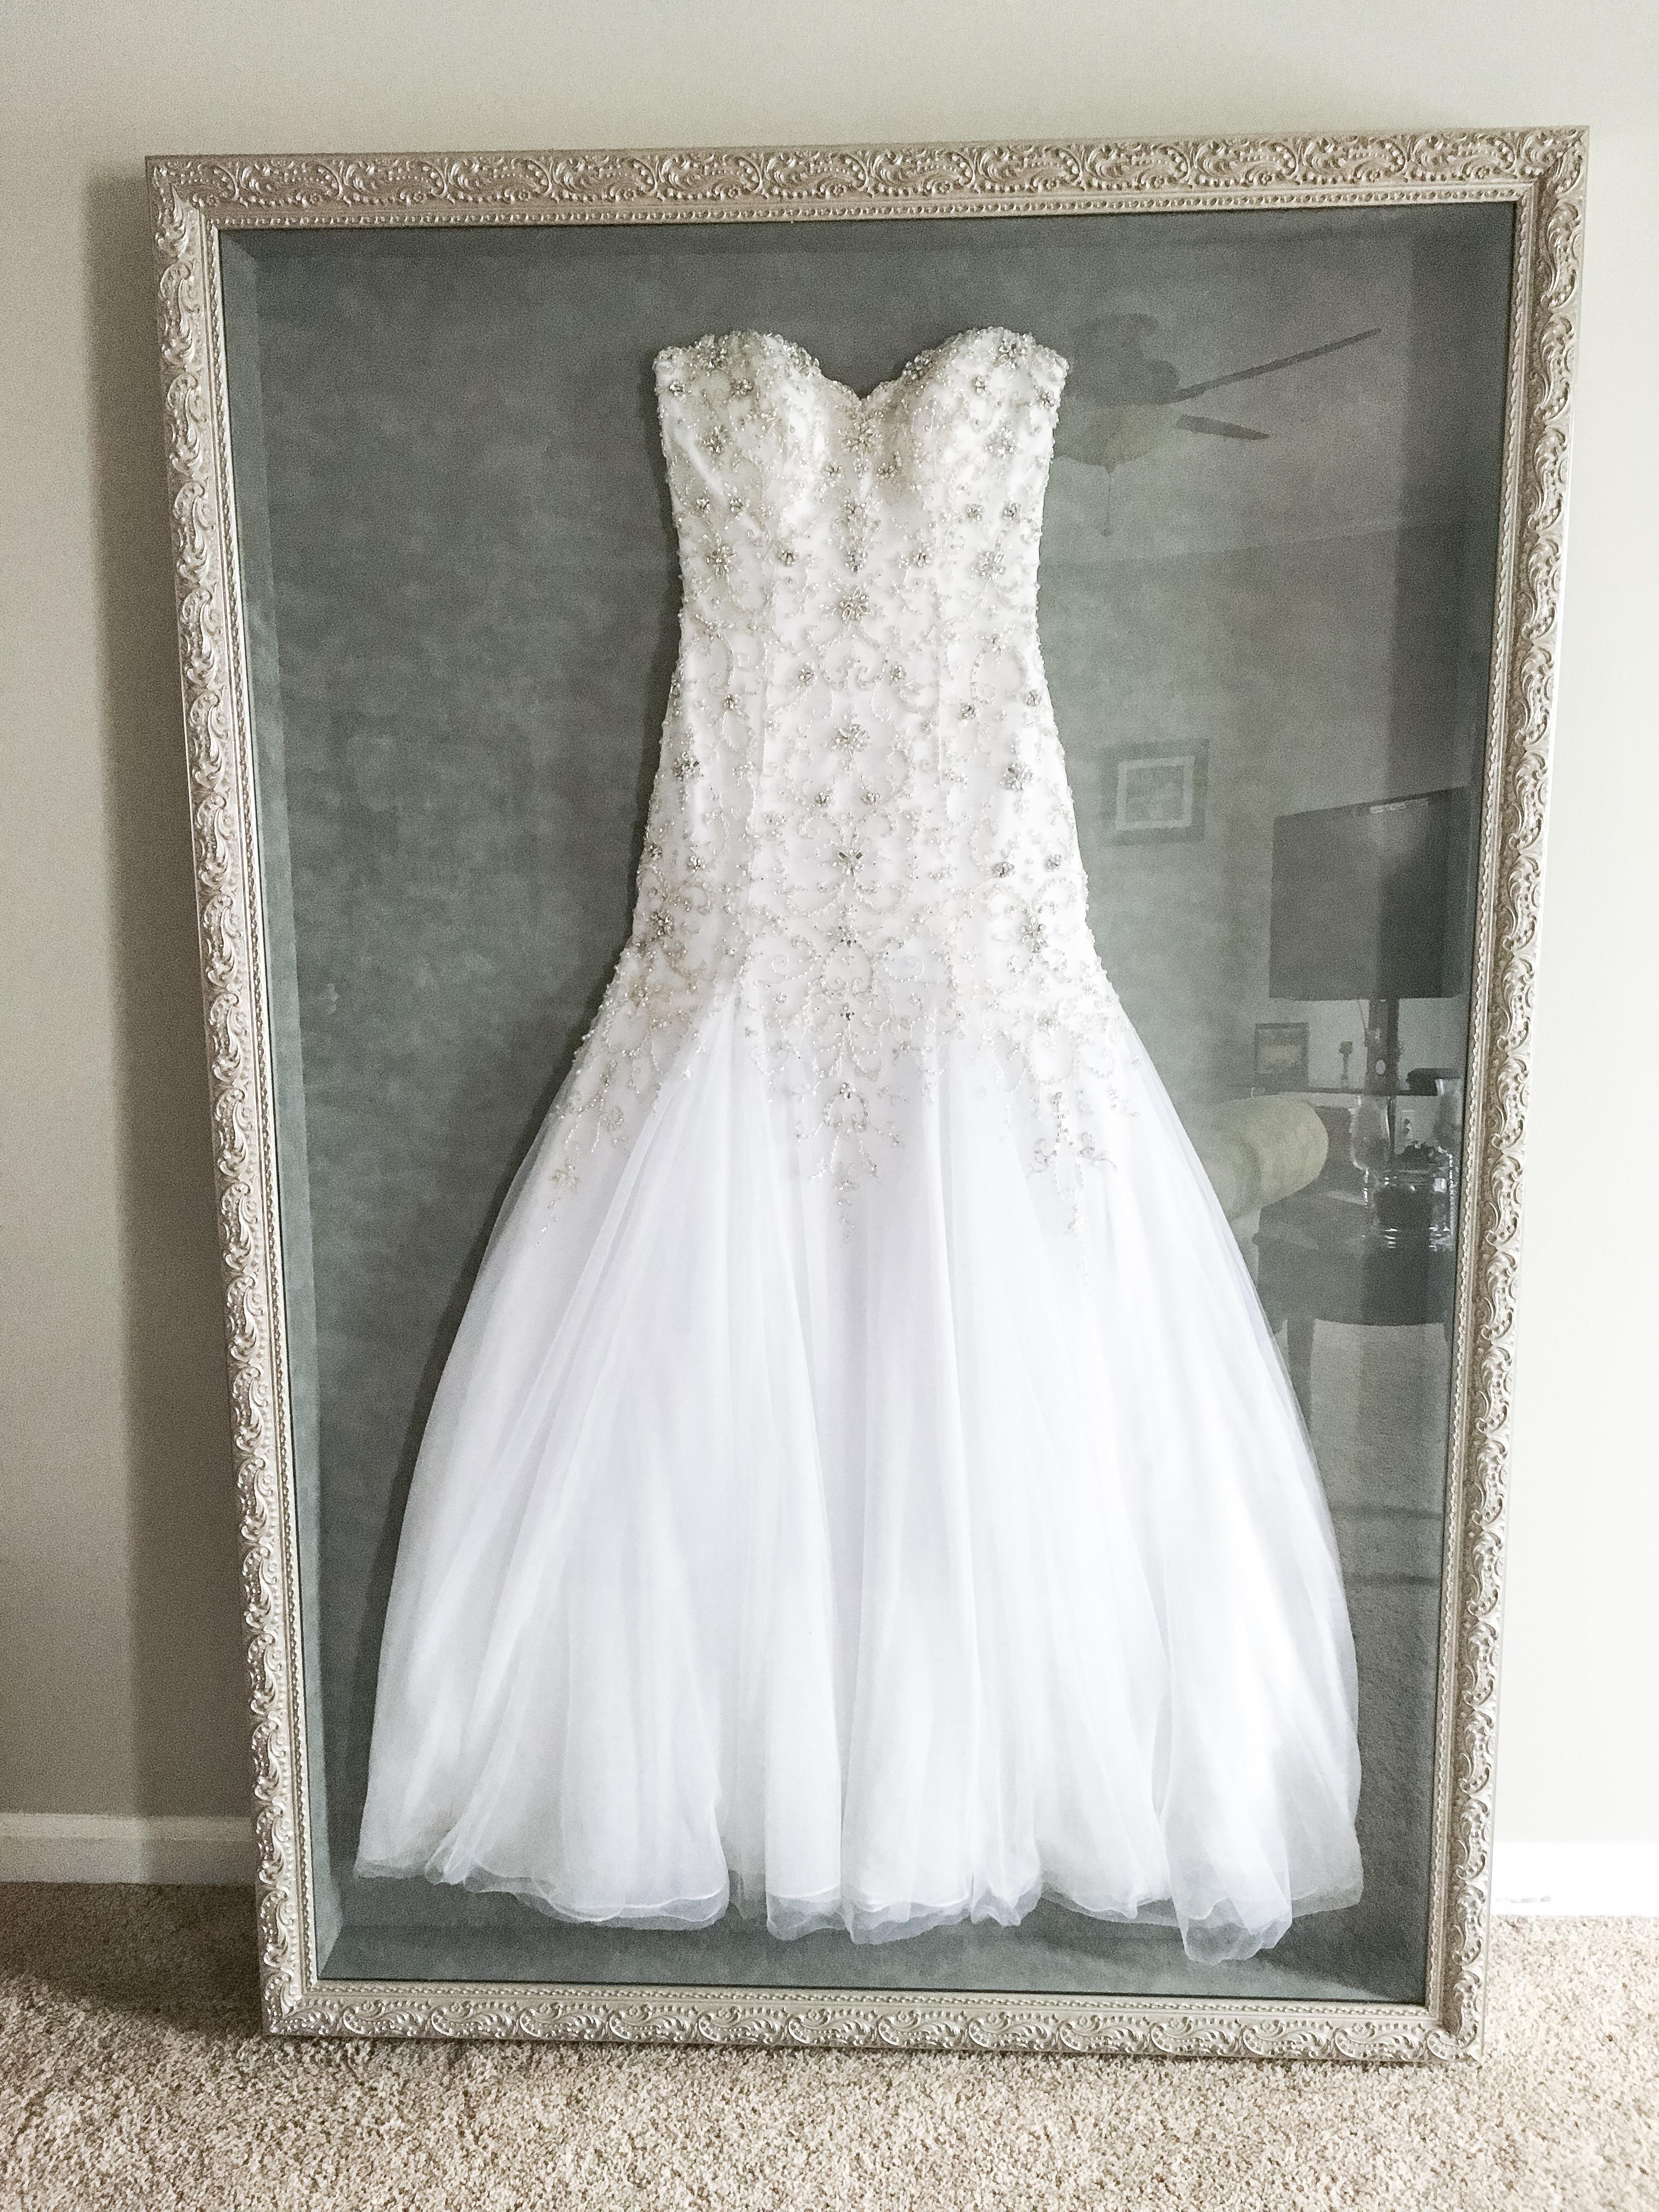 Wedding Dress Frame Ideas To Preserve Your Precious Memories  Page 2 of 2